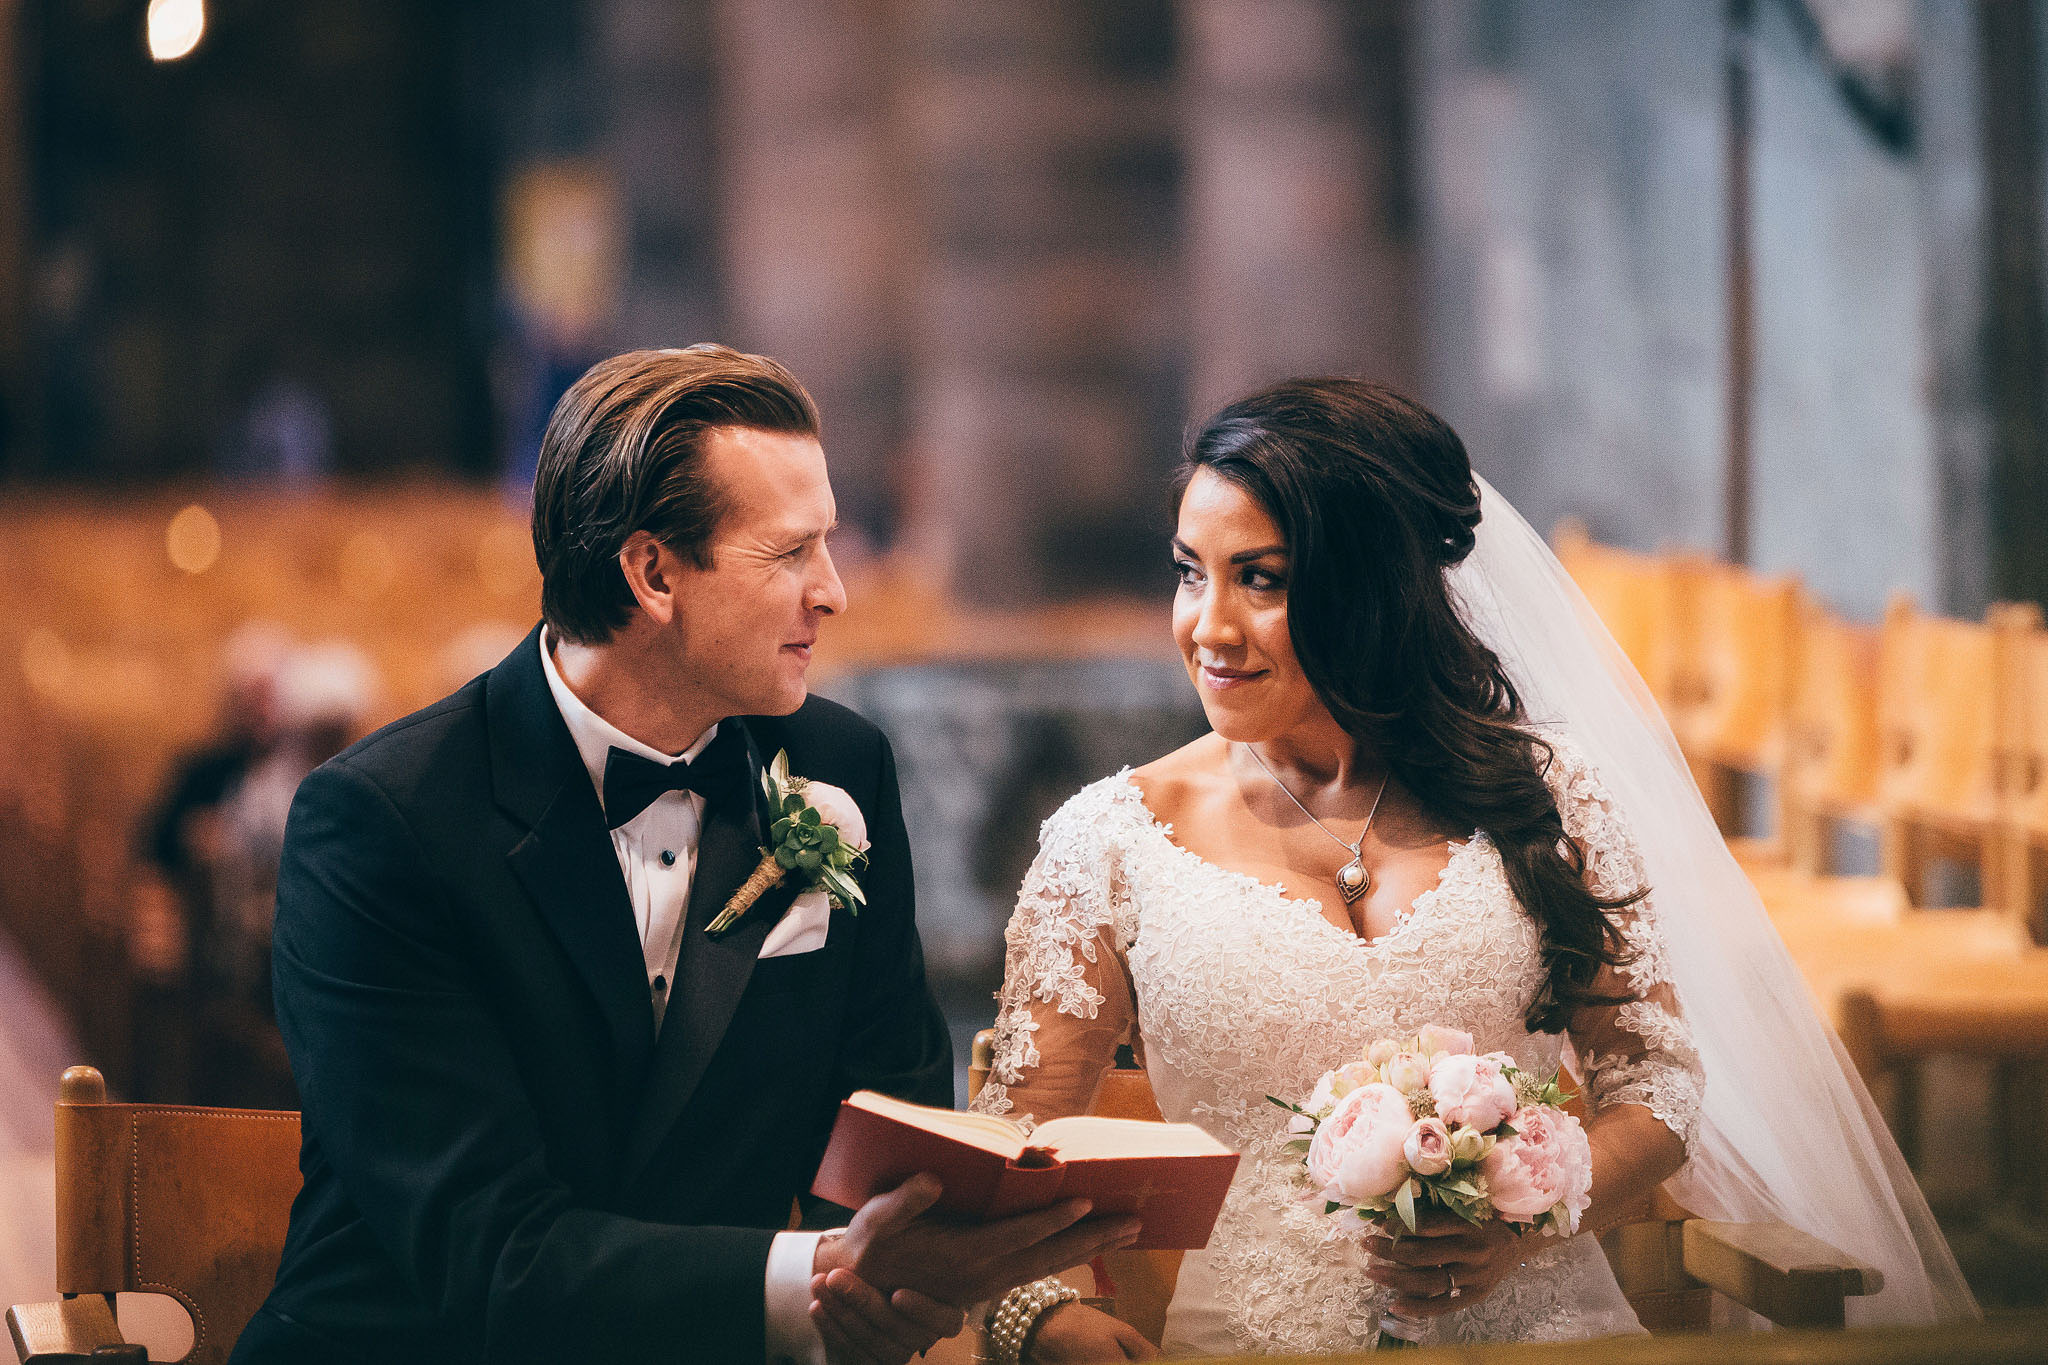 Wedding+Photographer+Norway+Bryllupsfotograf+Casey+Arneson+MK-120.jpg